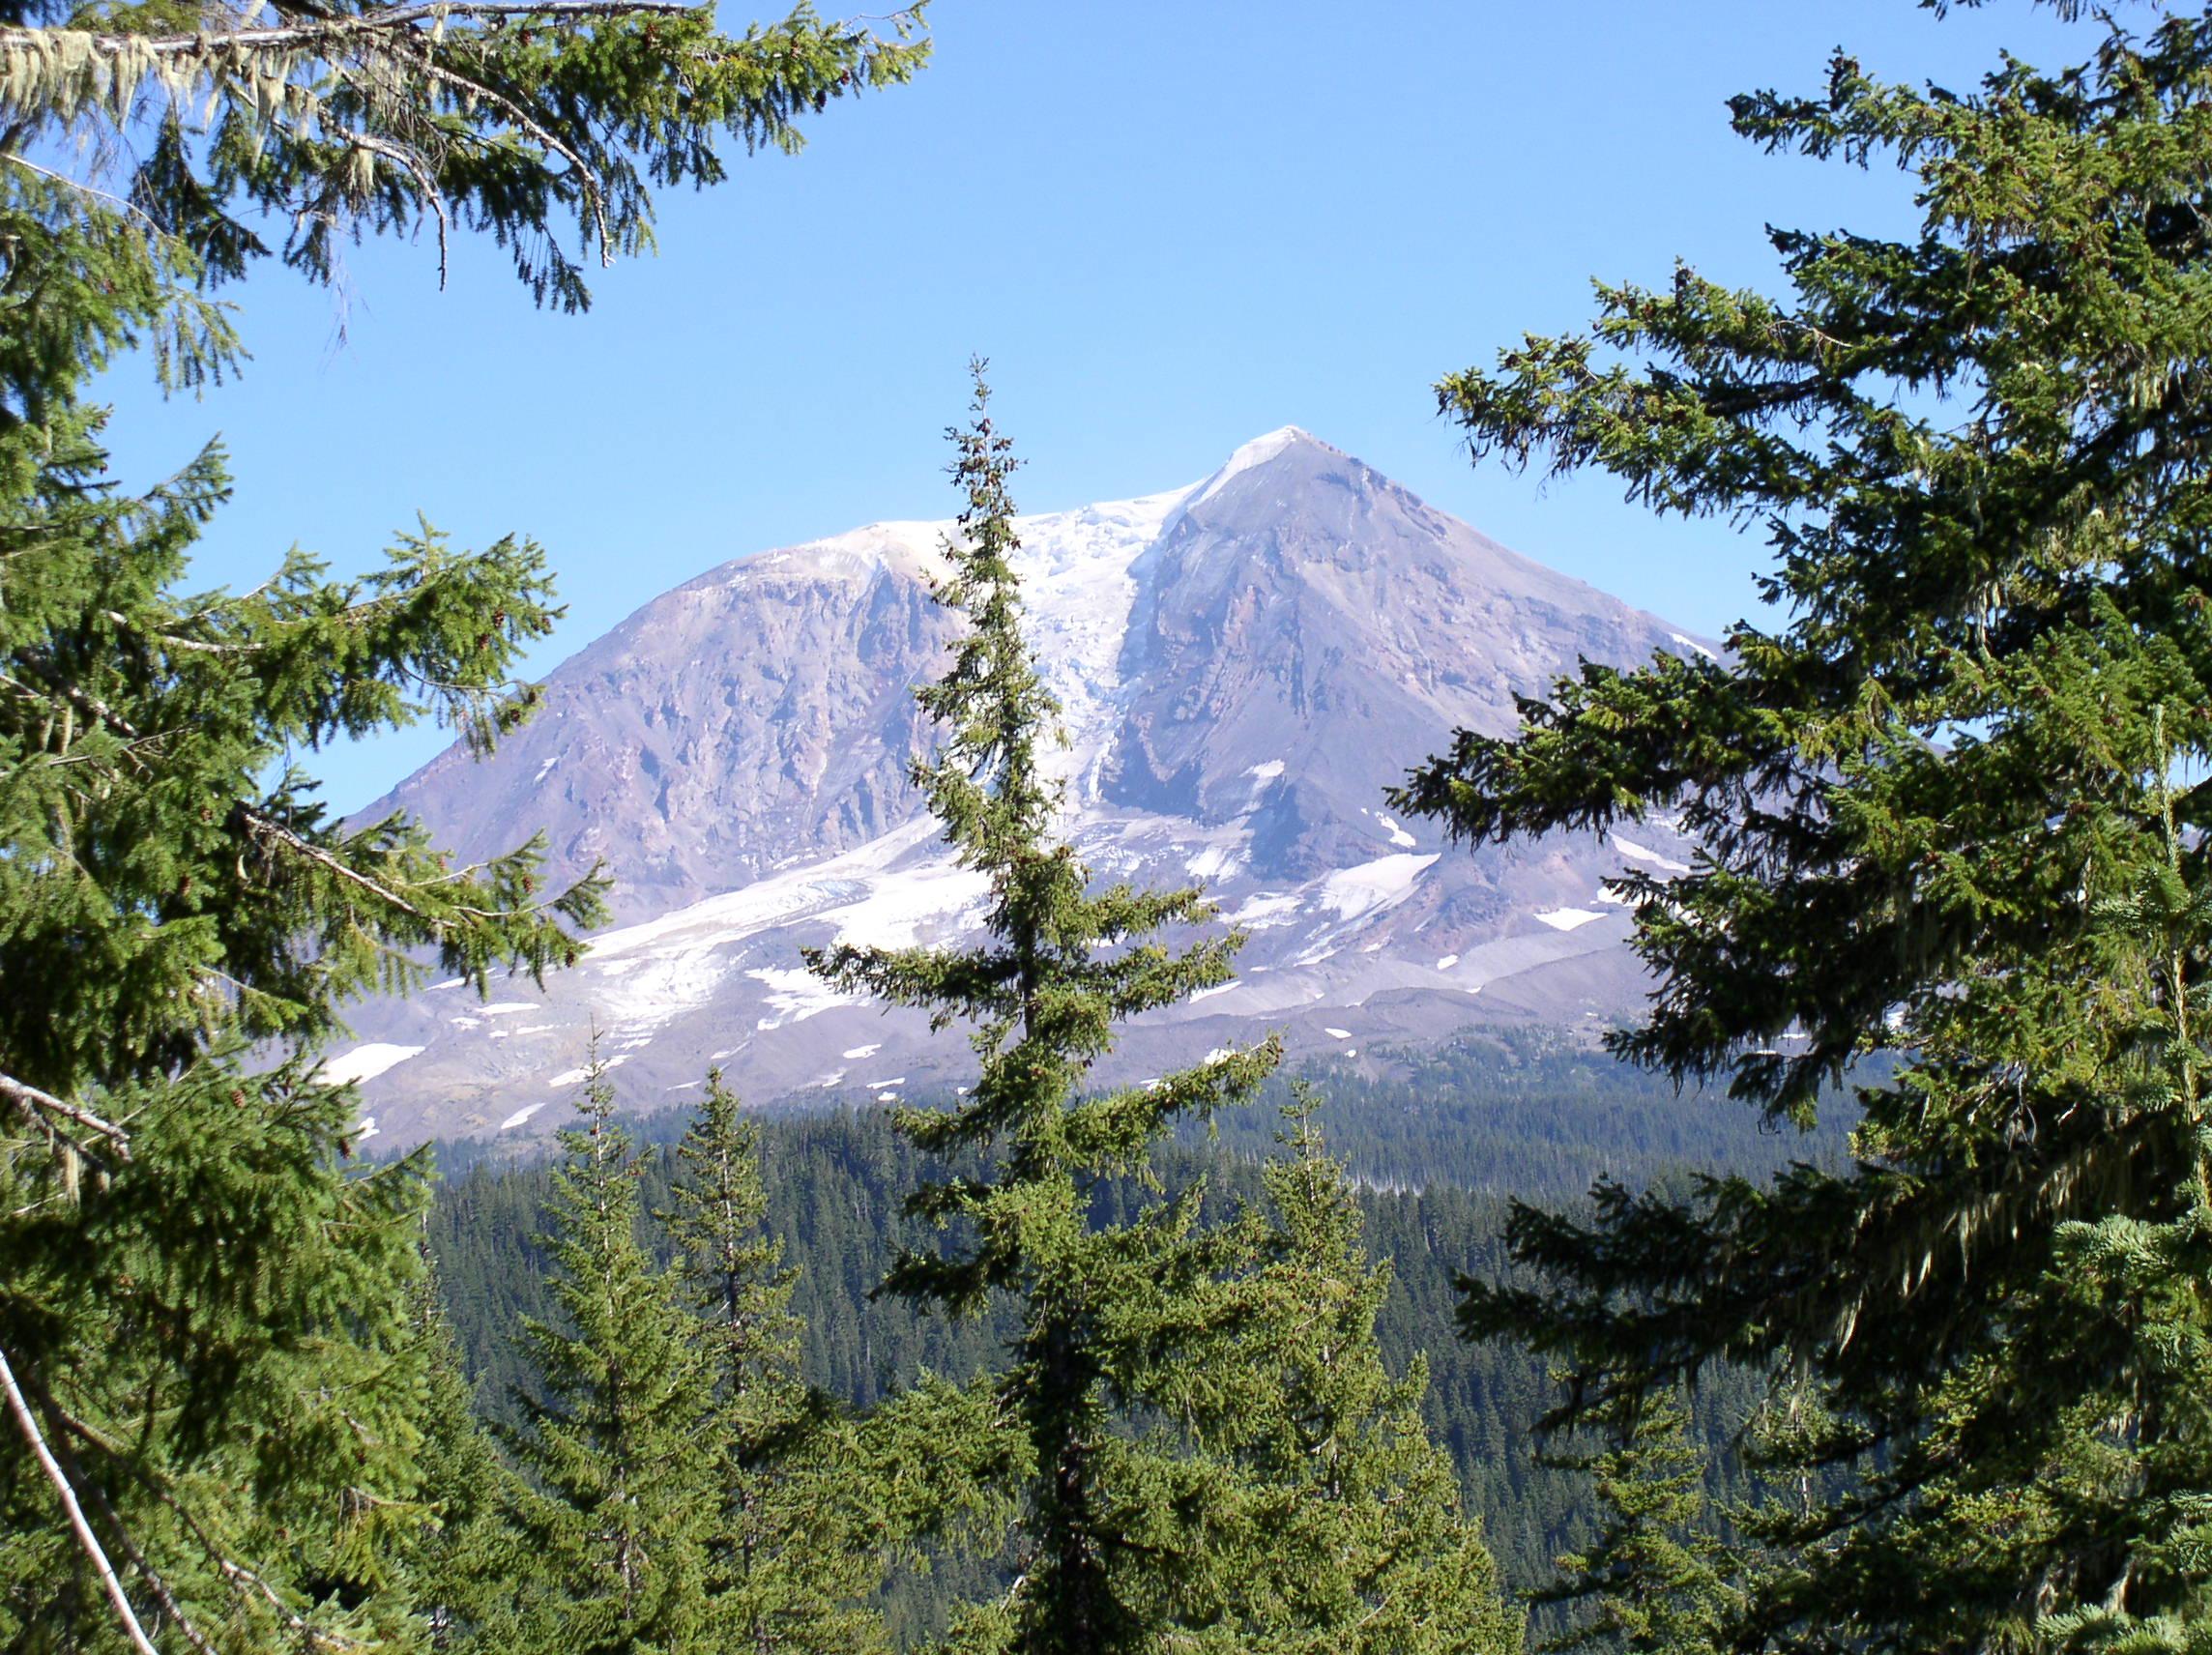 Mt. Adams, Cascade Range, Washington